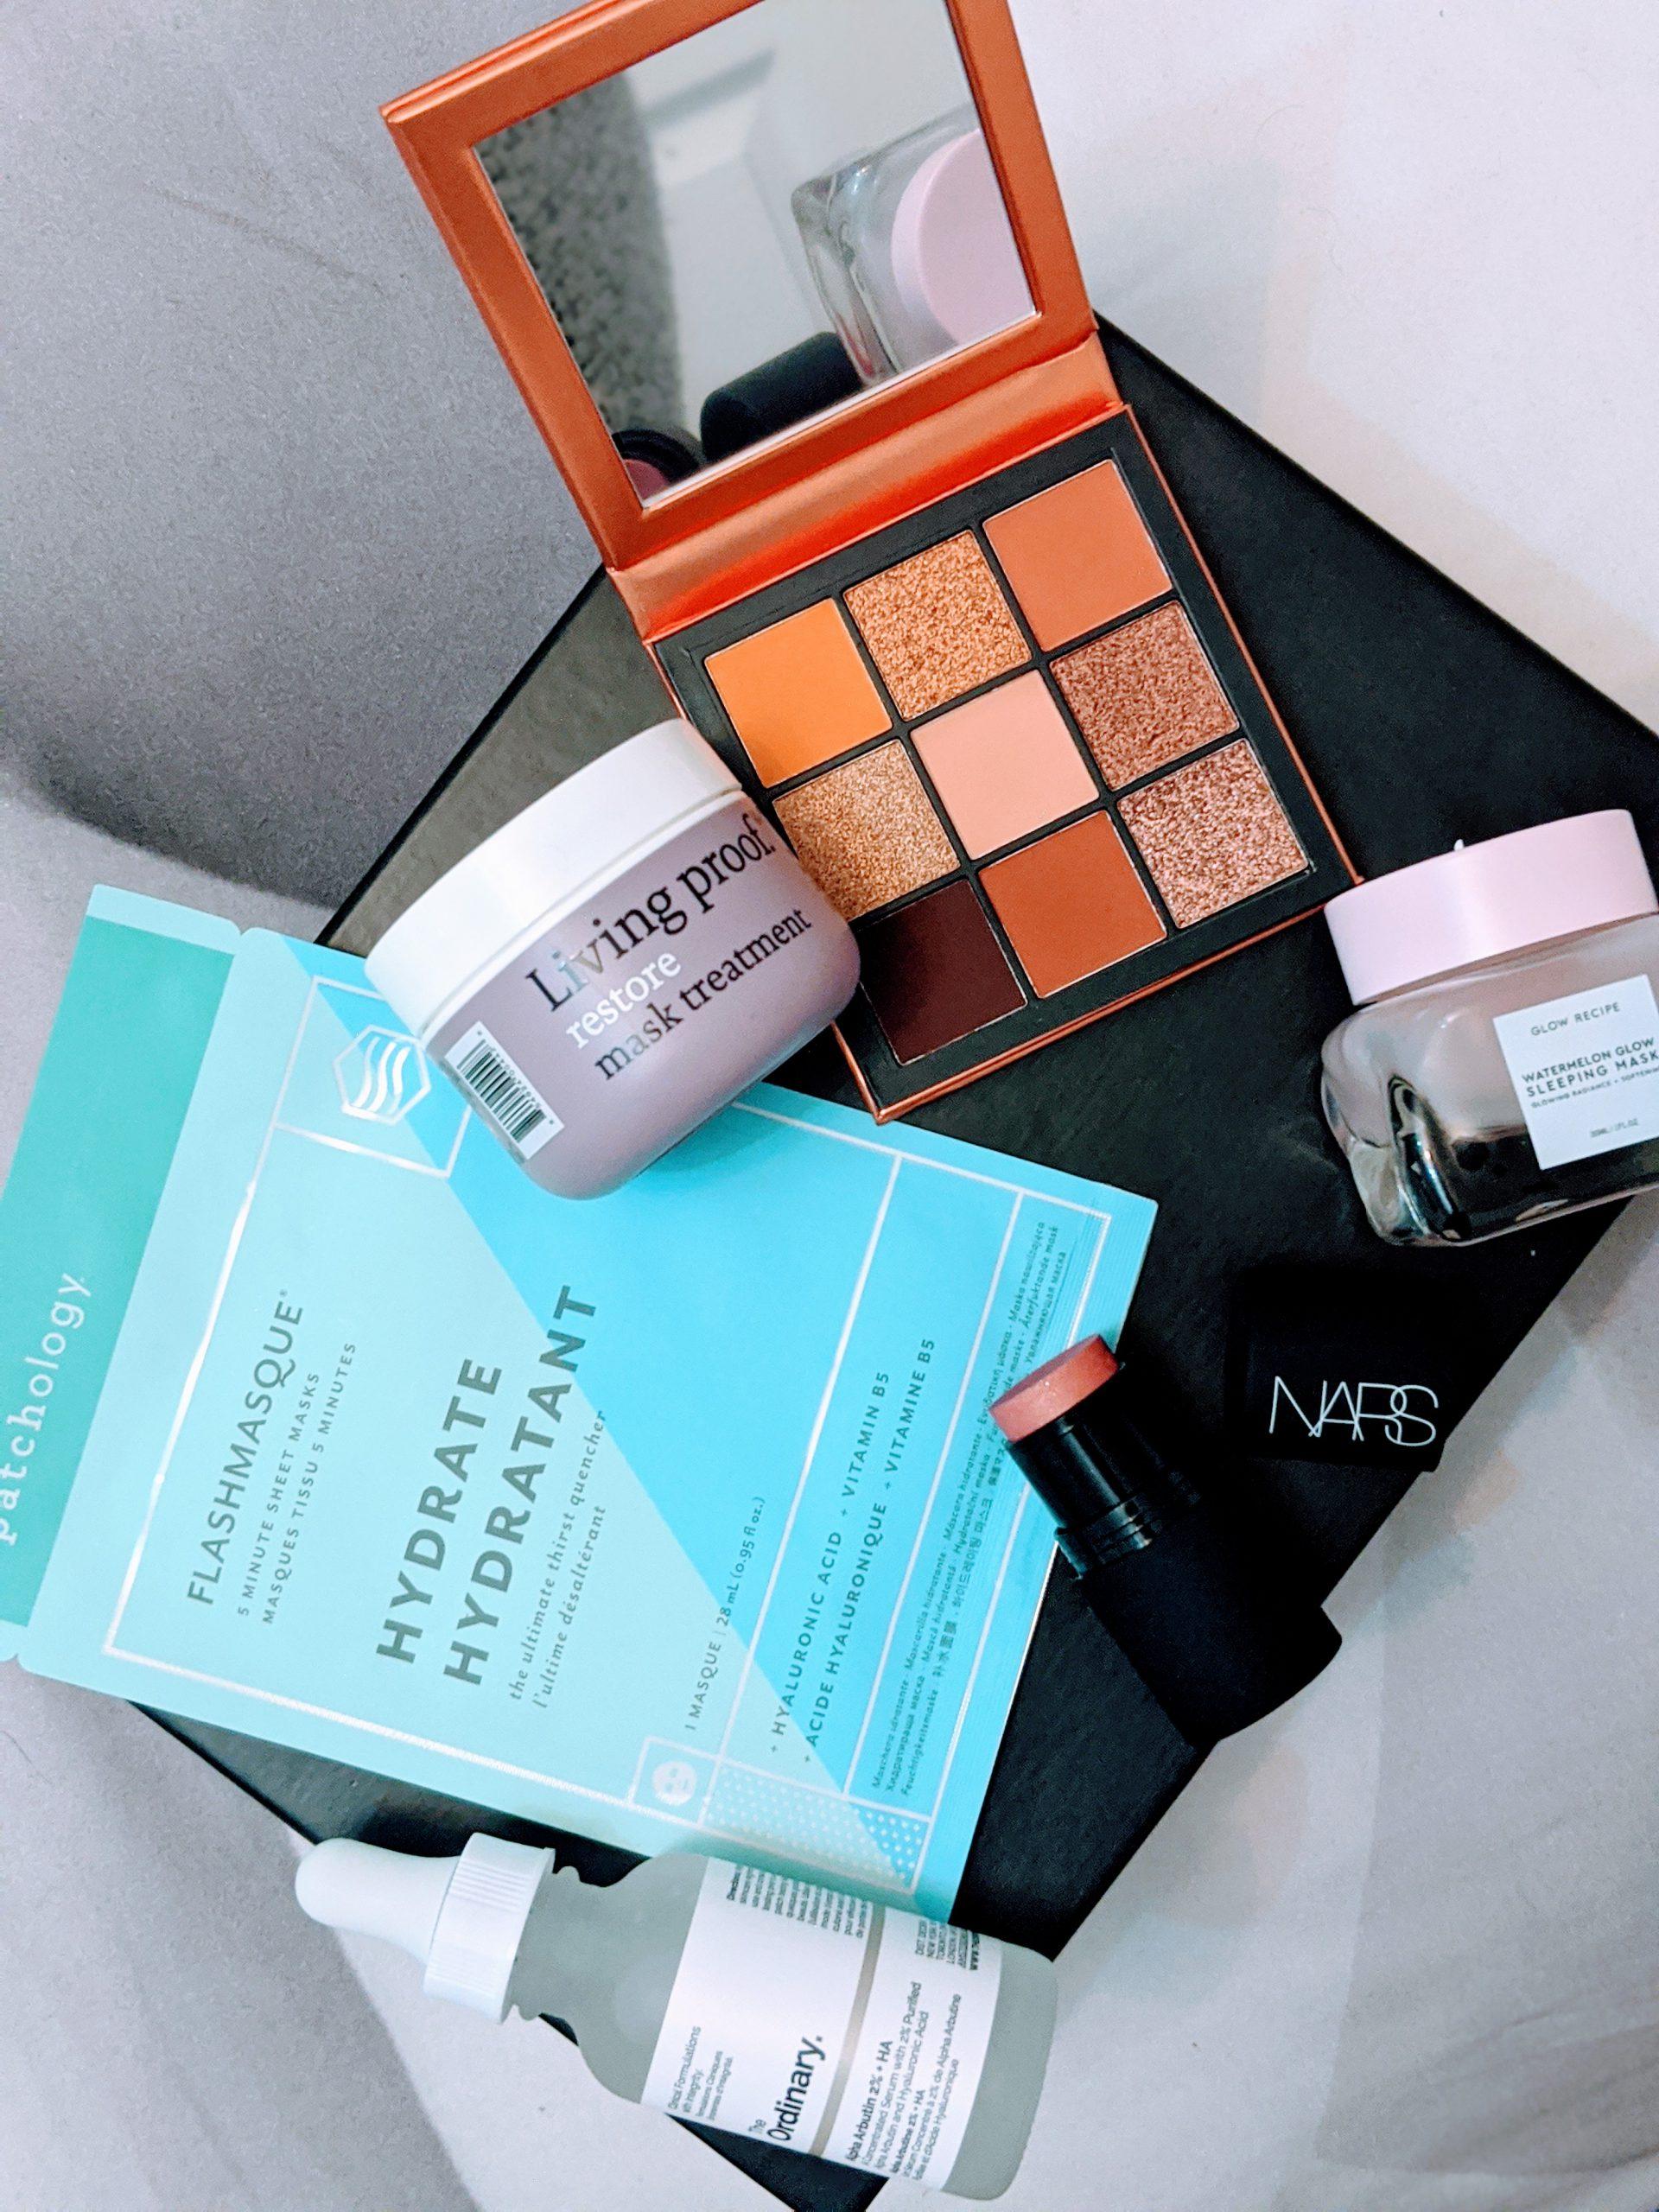 Let's Take a Look inside………The Cult Beauty Starter Kit….